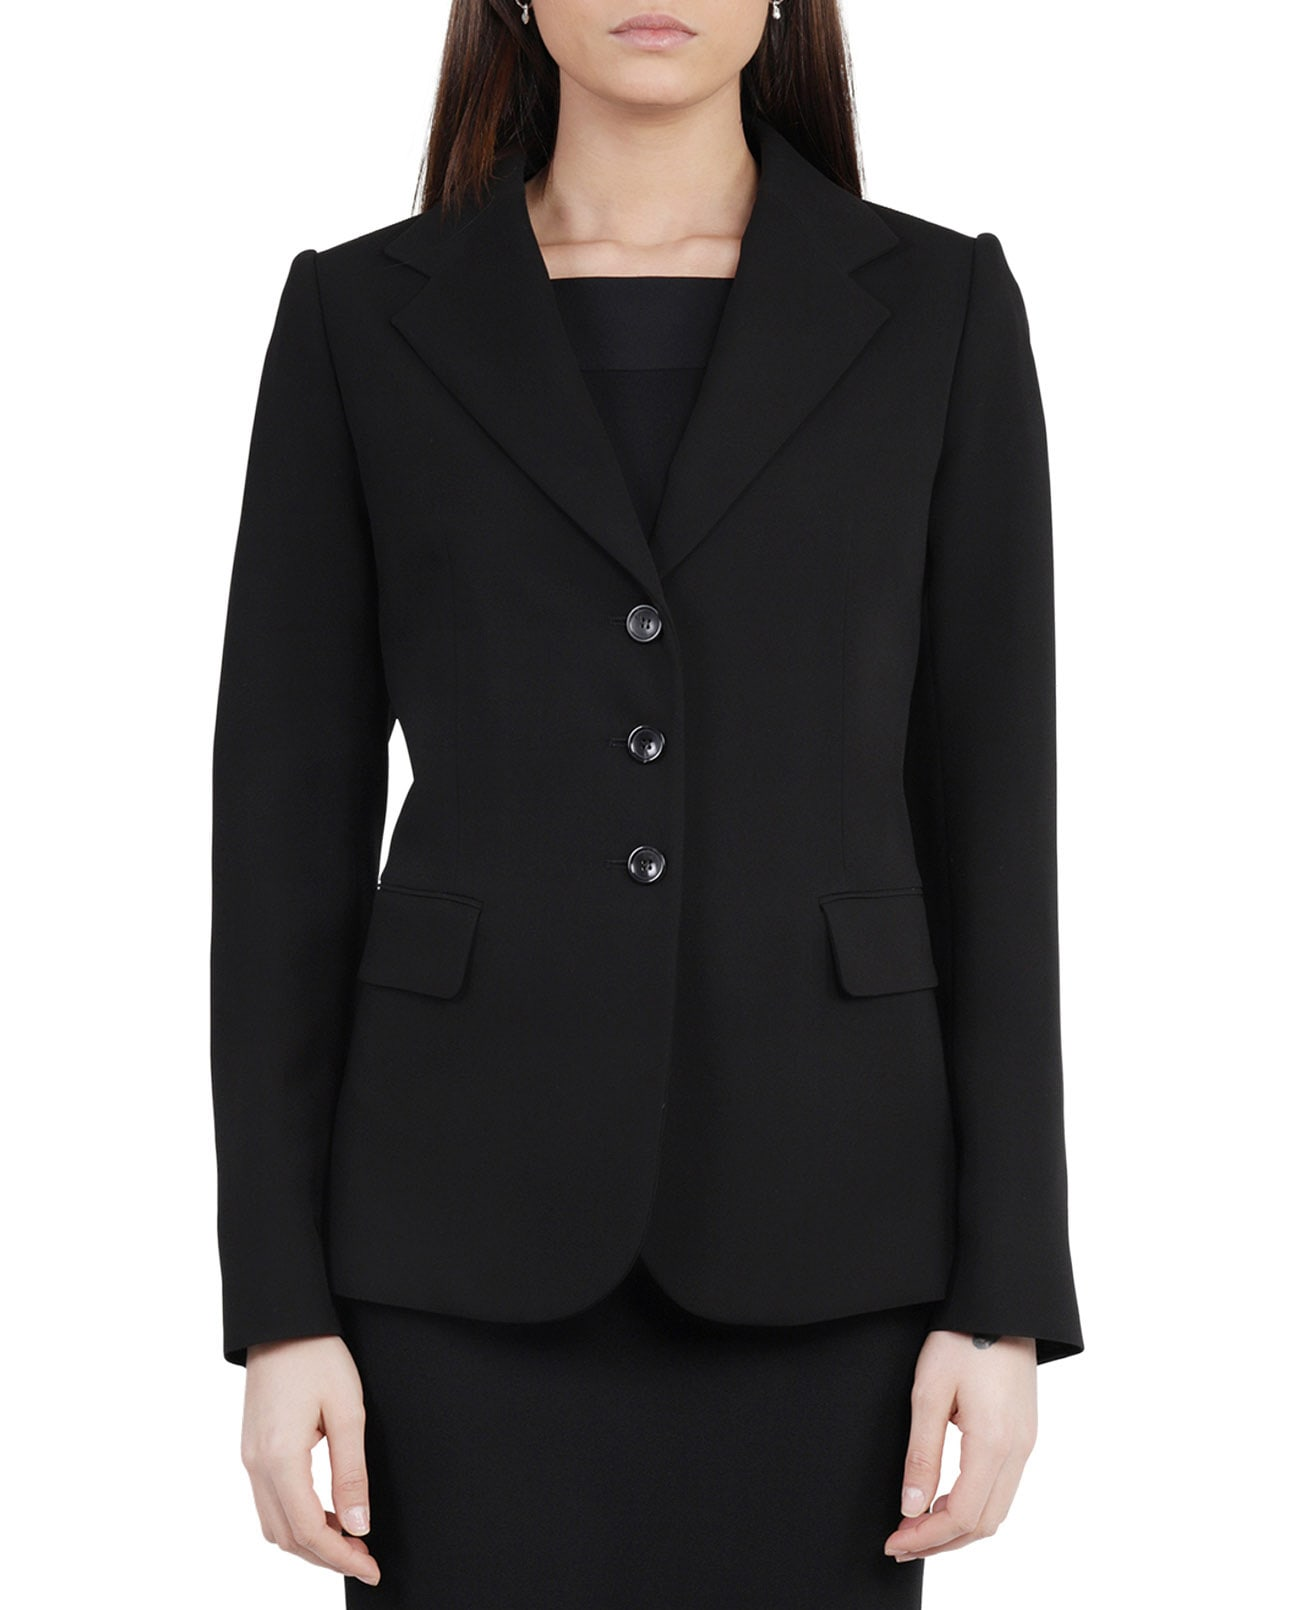 Alaia Black Jacket